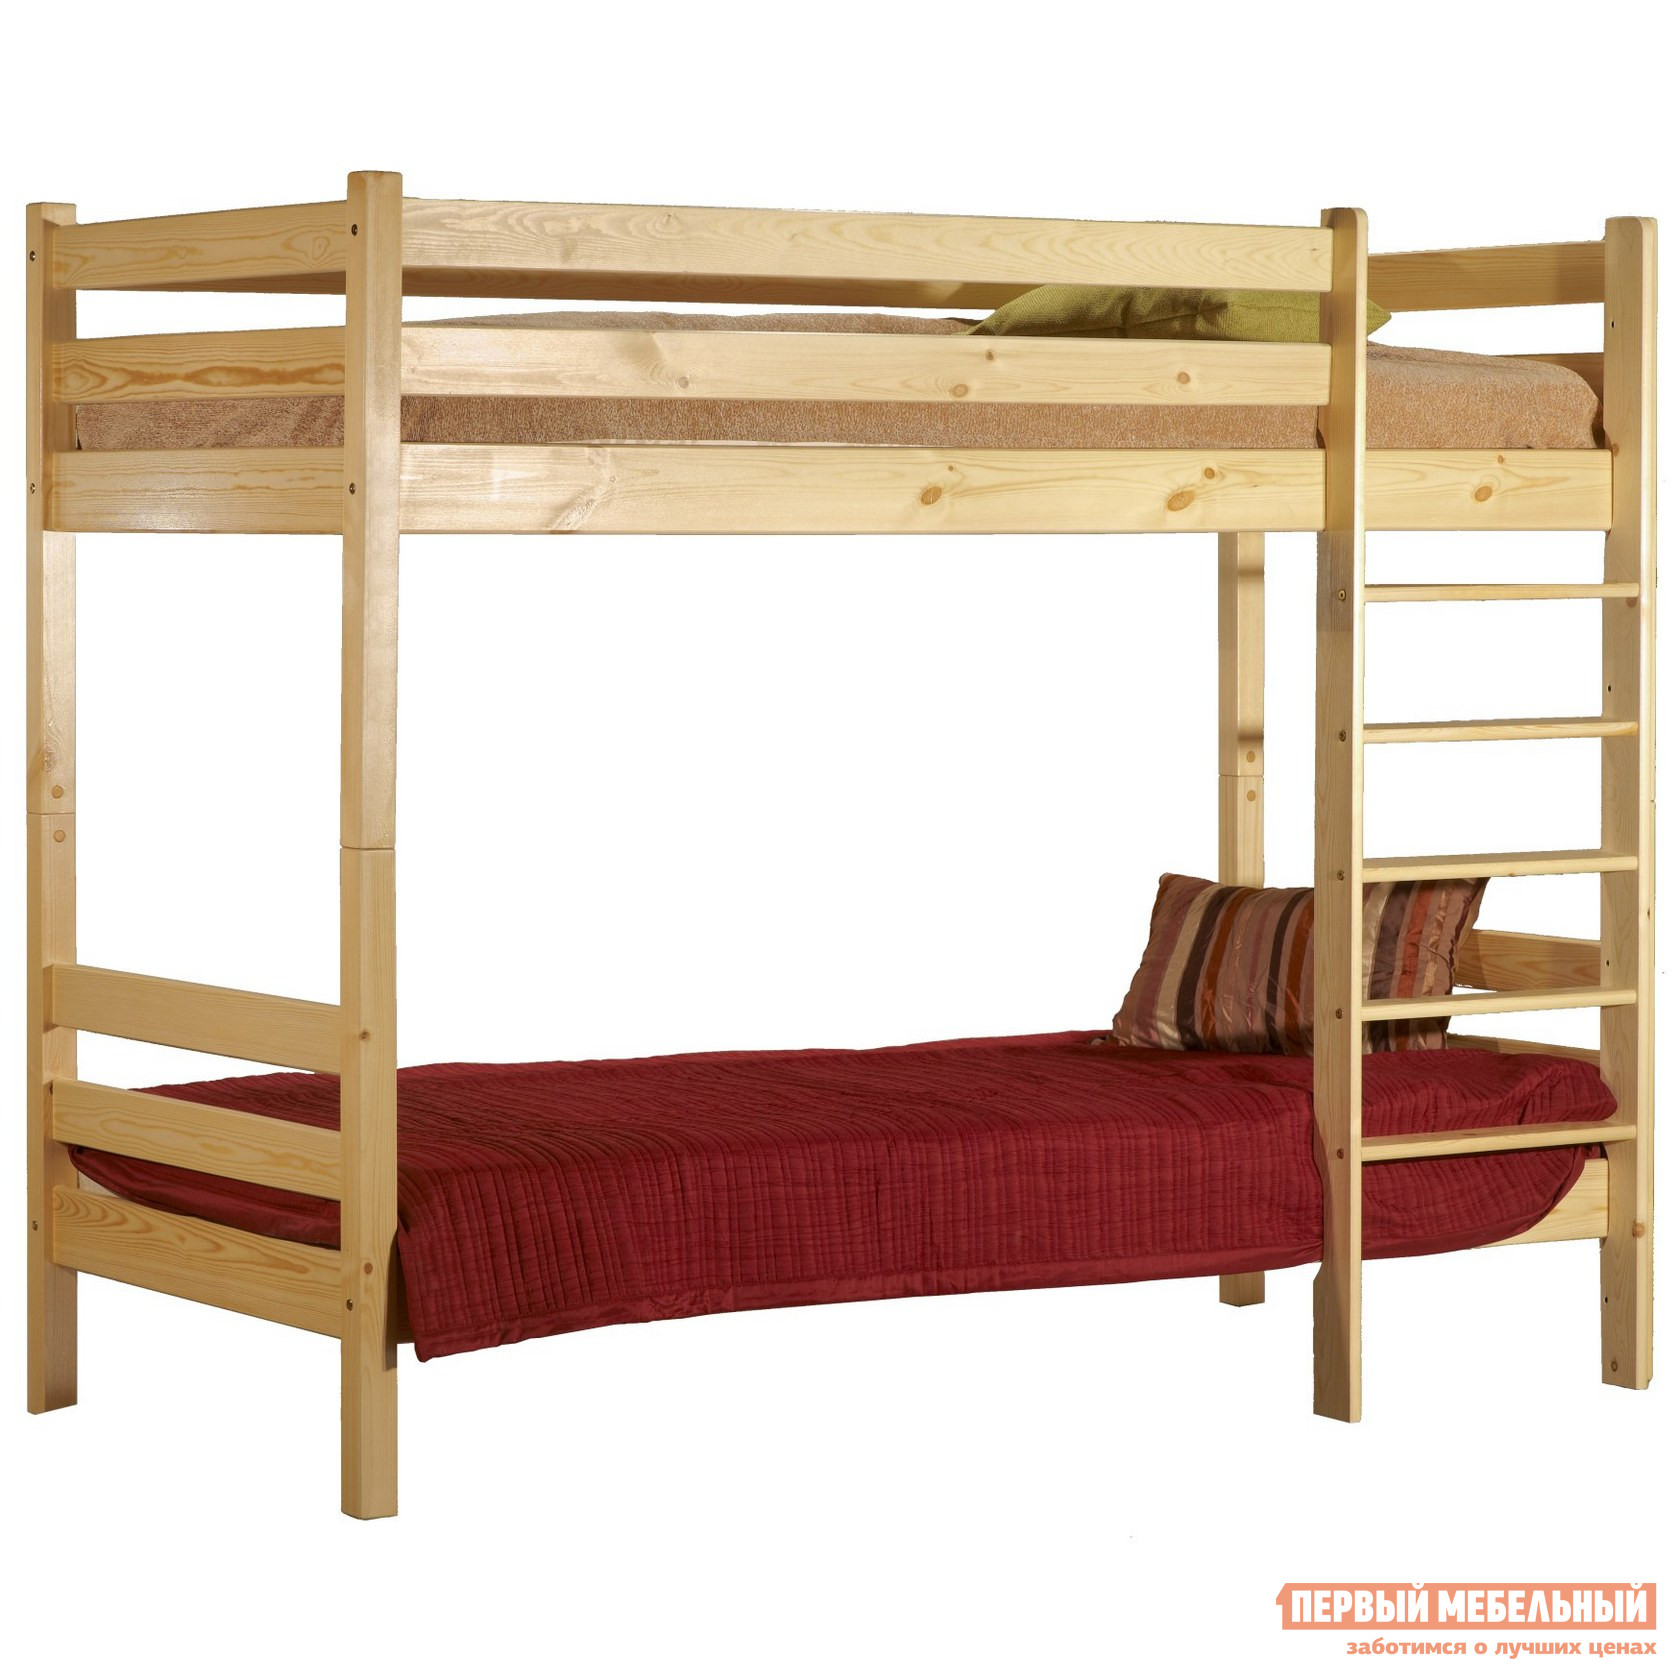 Двухъярусная кровать Timberica Кровать 2-ярусная Классик двухъярусная кровать для детей впк кровать 2 х ярусная polini kids simple 5000